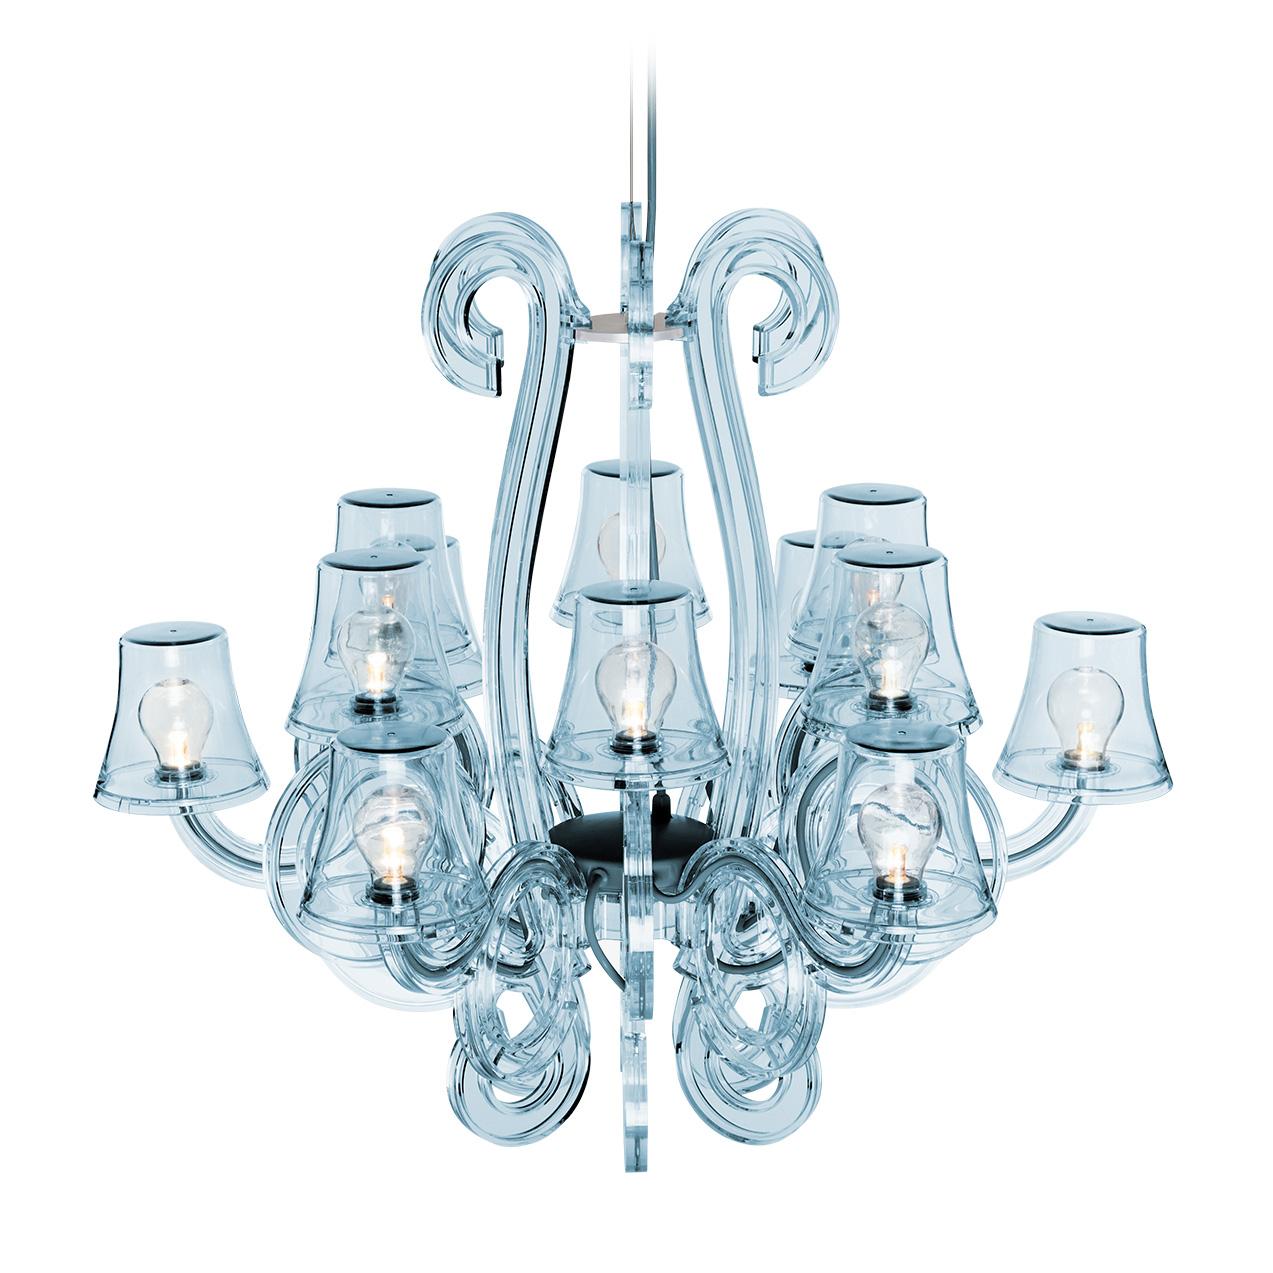 light keyword teal middleton crystal wayfair chandelier